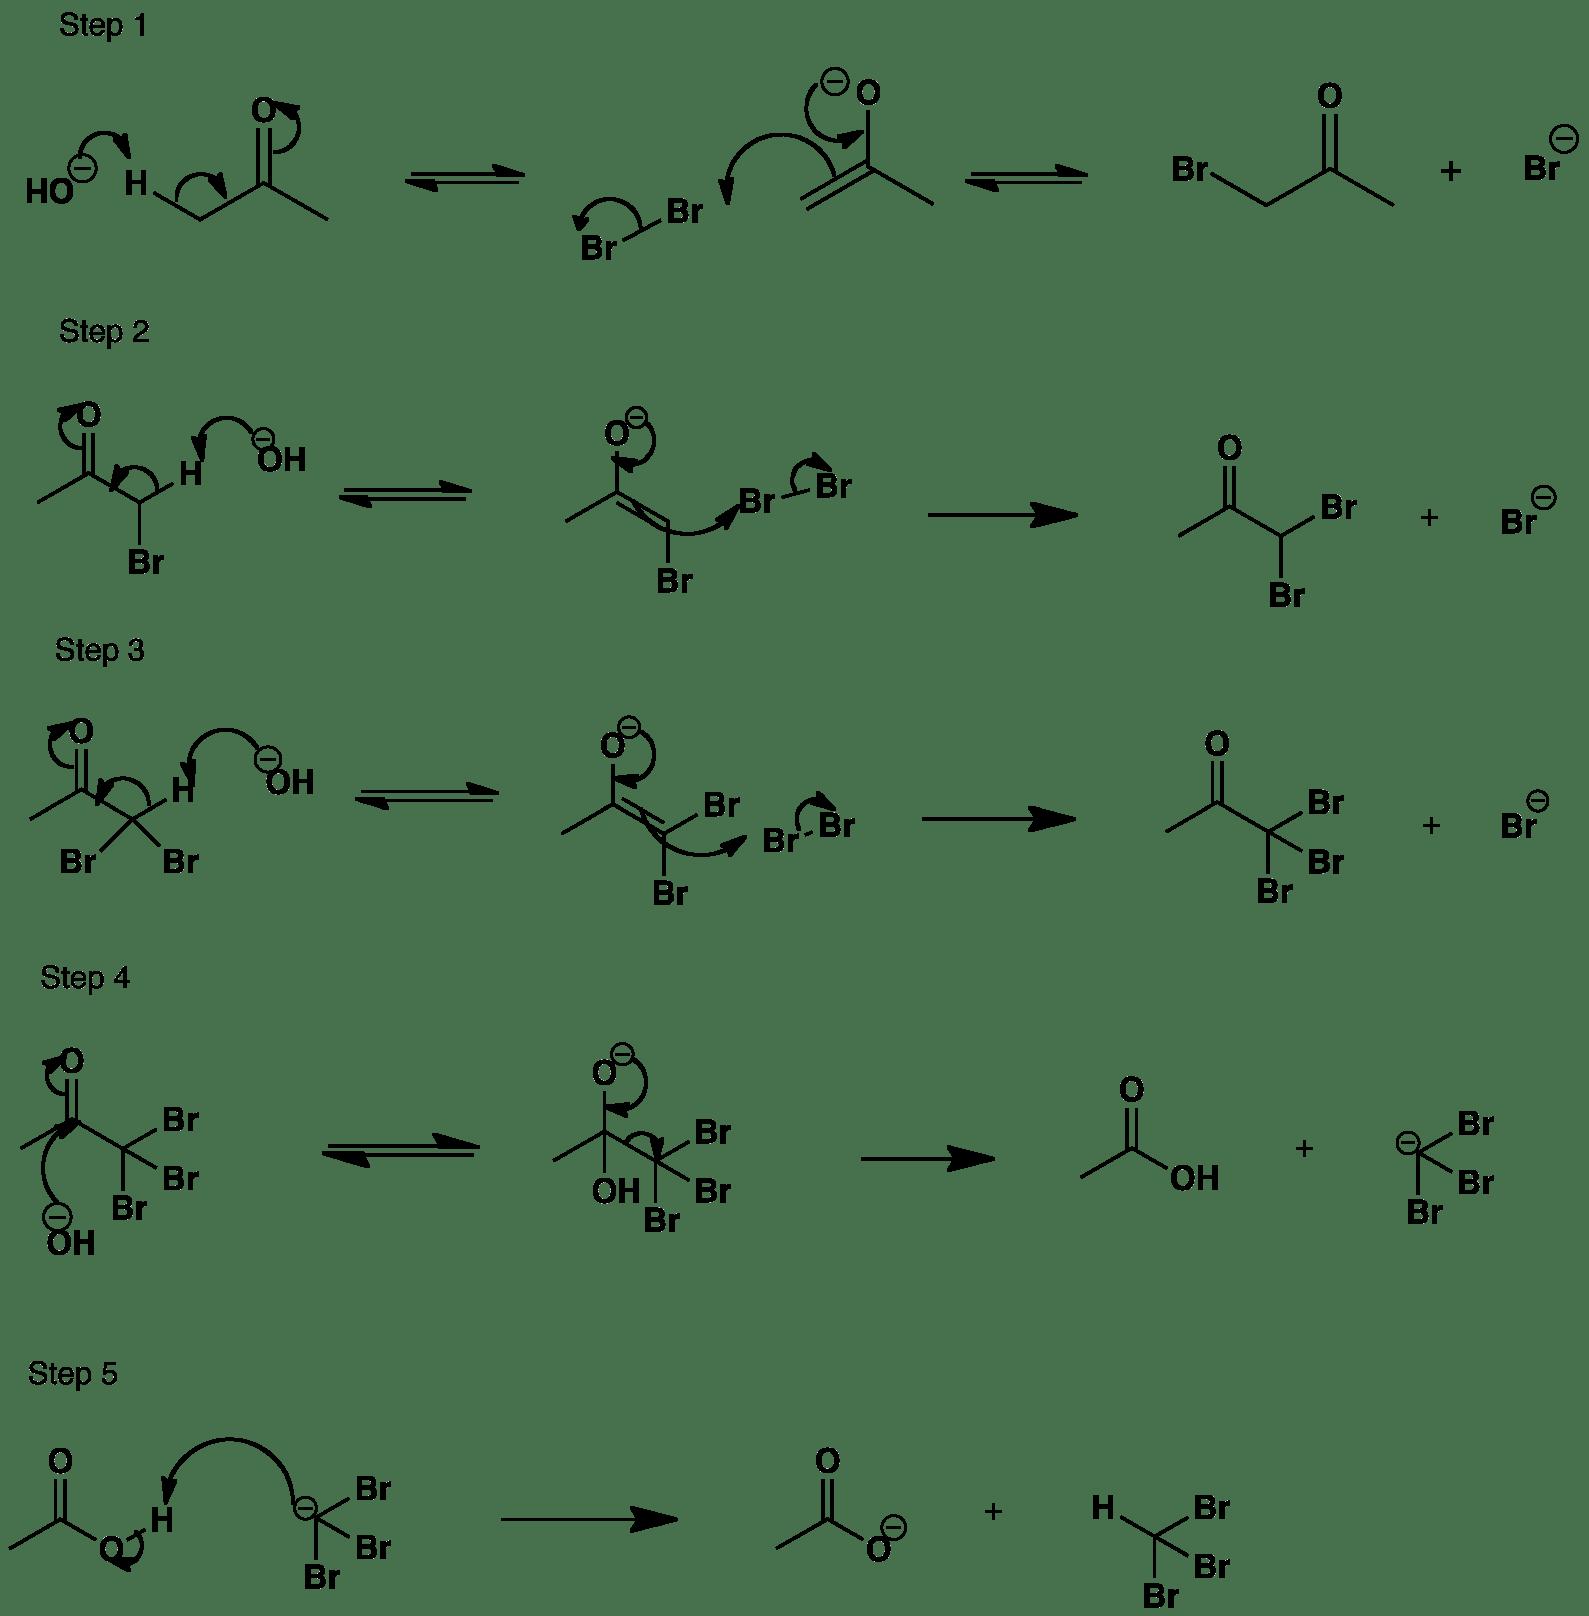 Base Catalysed Bromination Summary